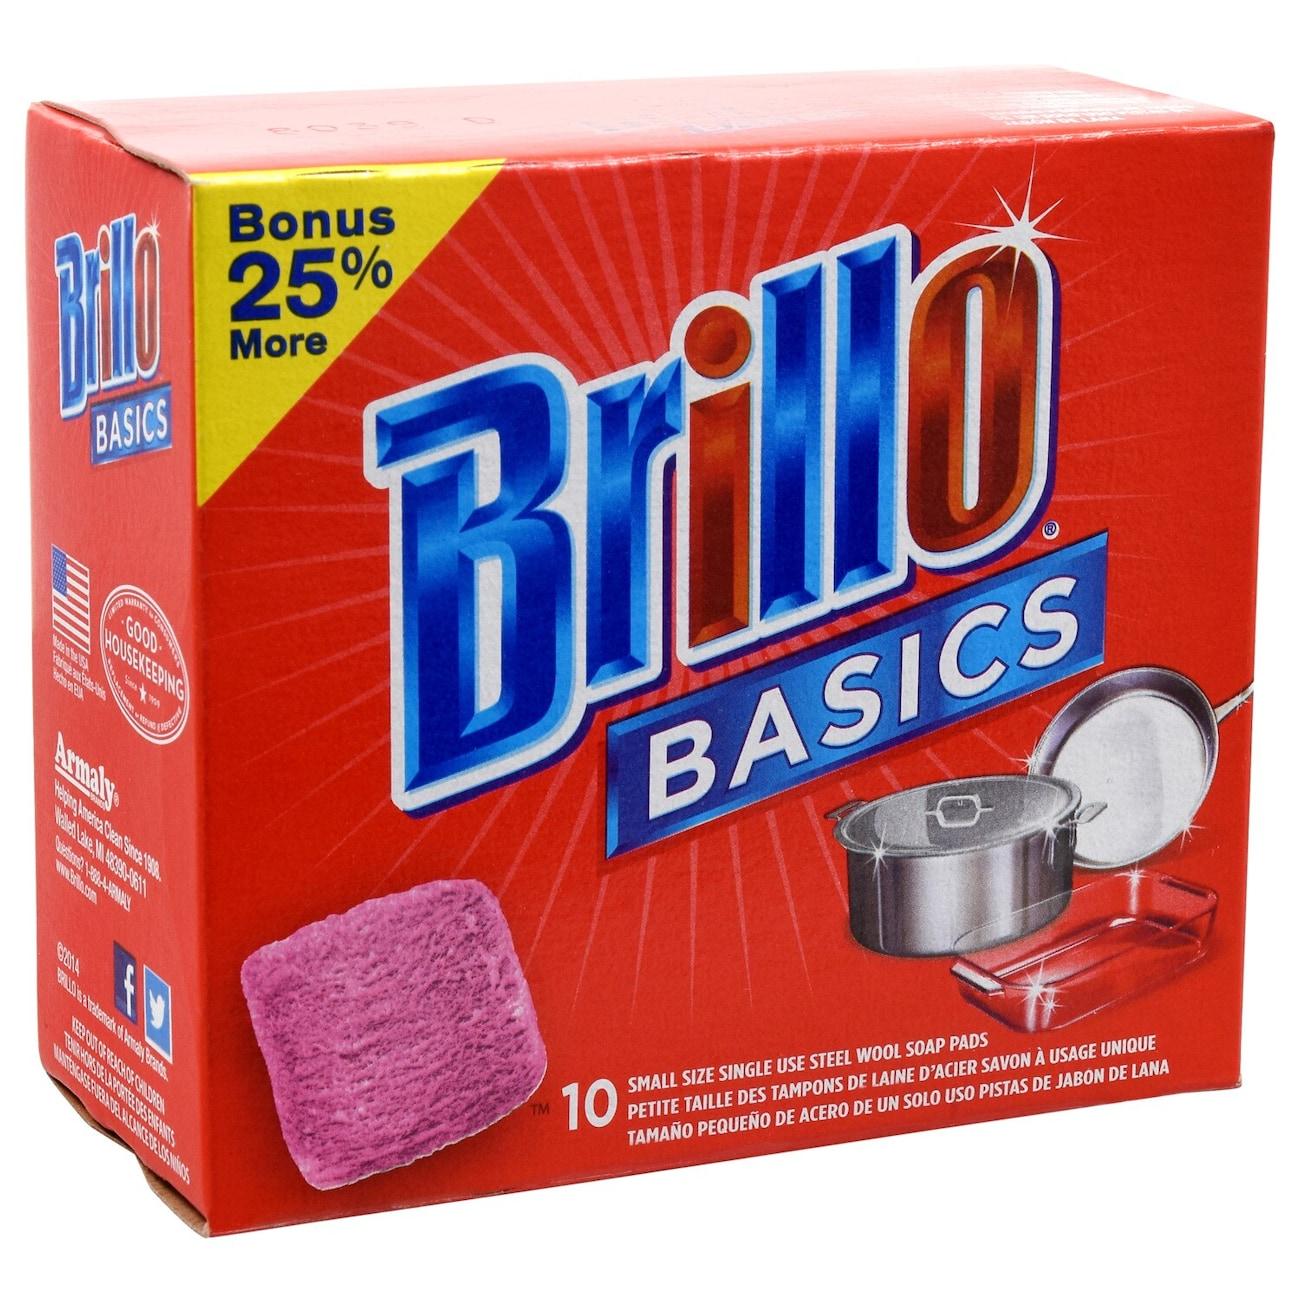 Brillo Basics Steel Wool Soap Pads 8 Ct Bo